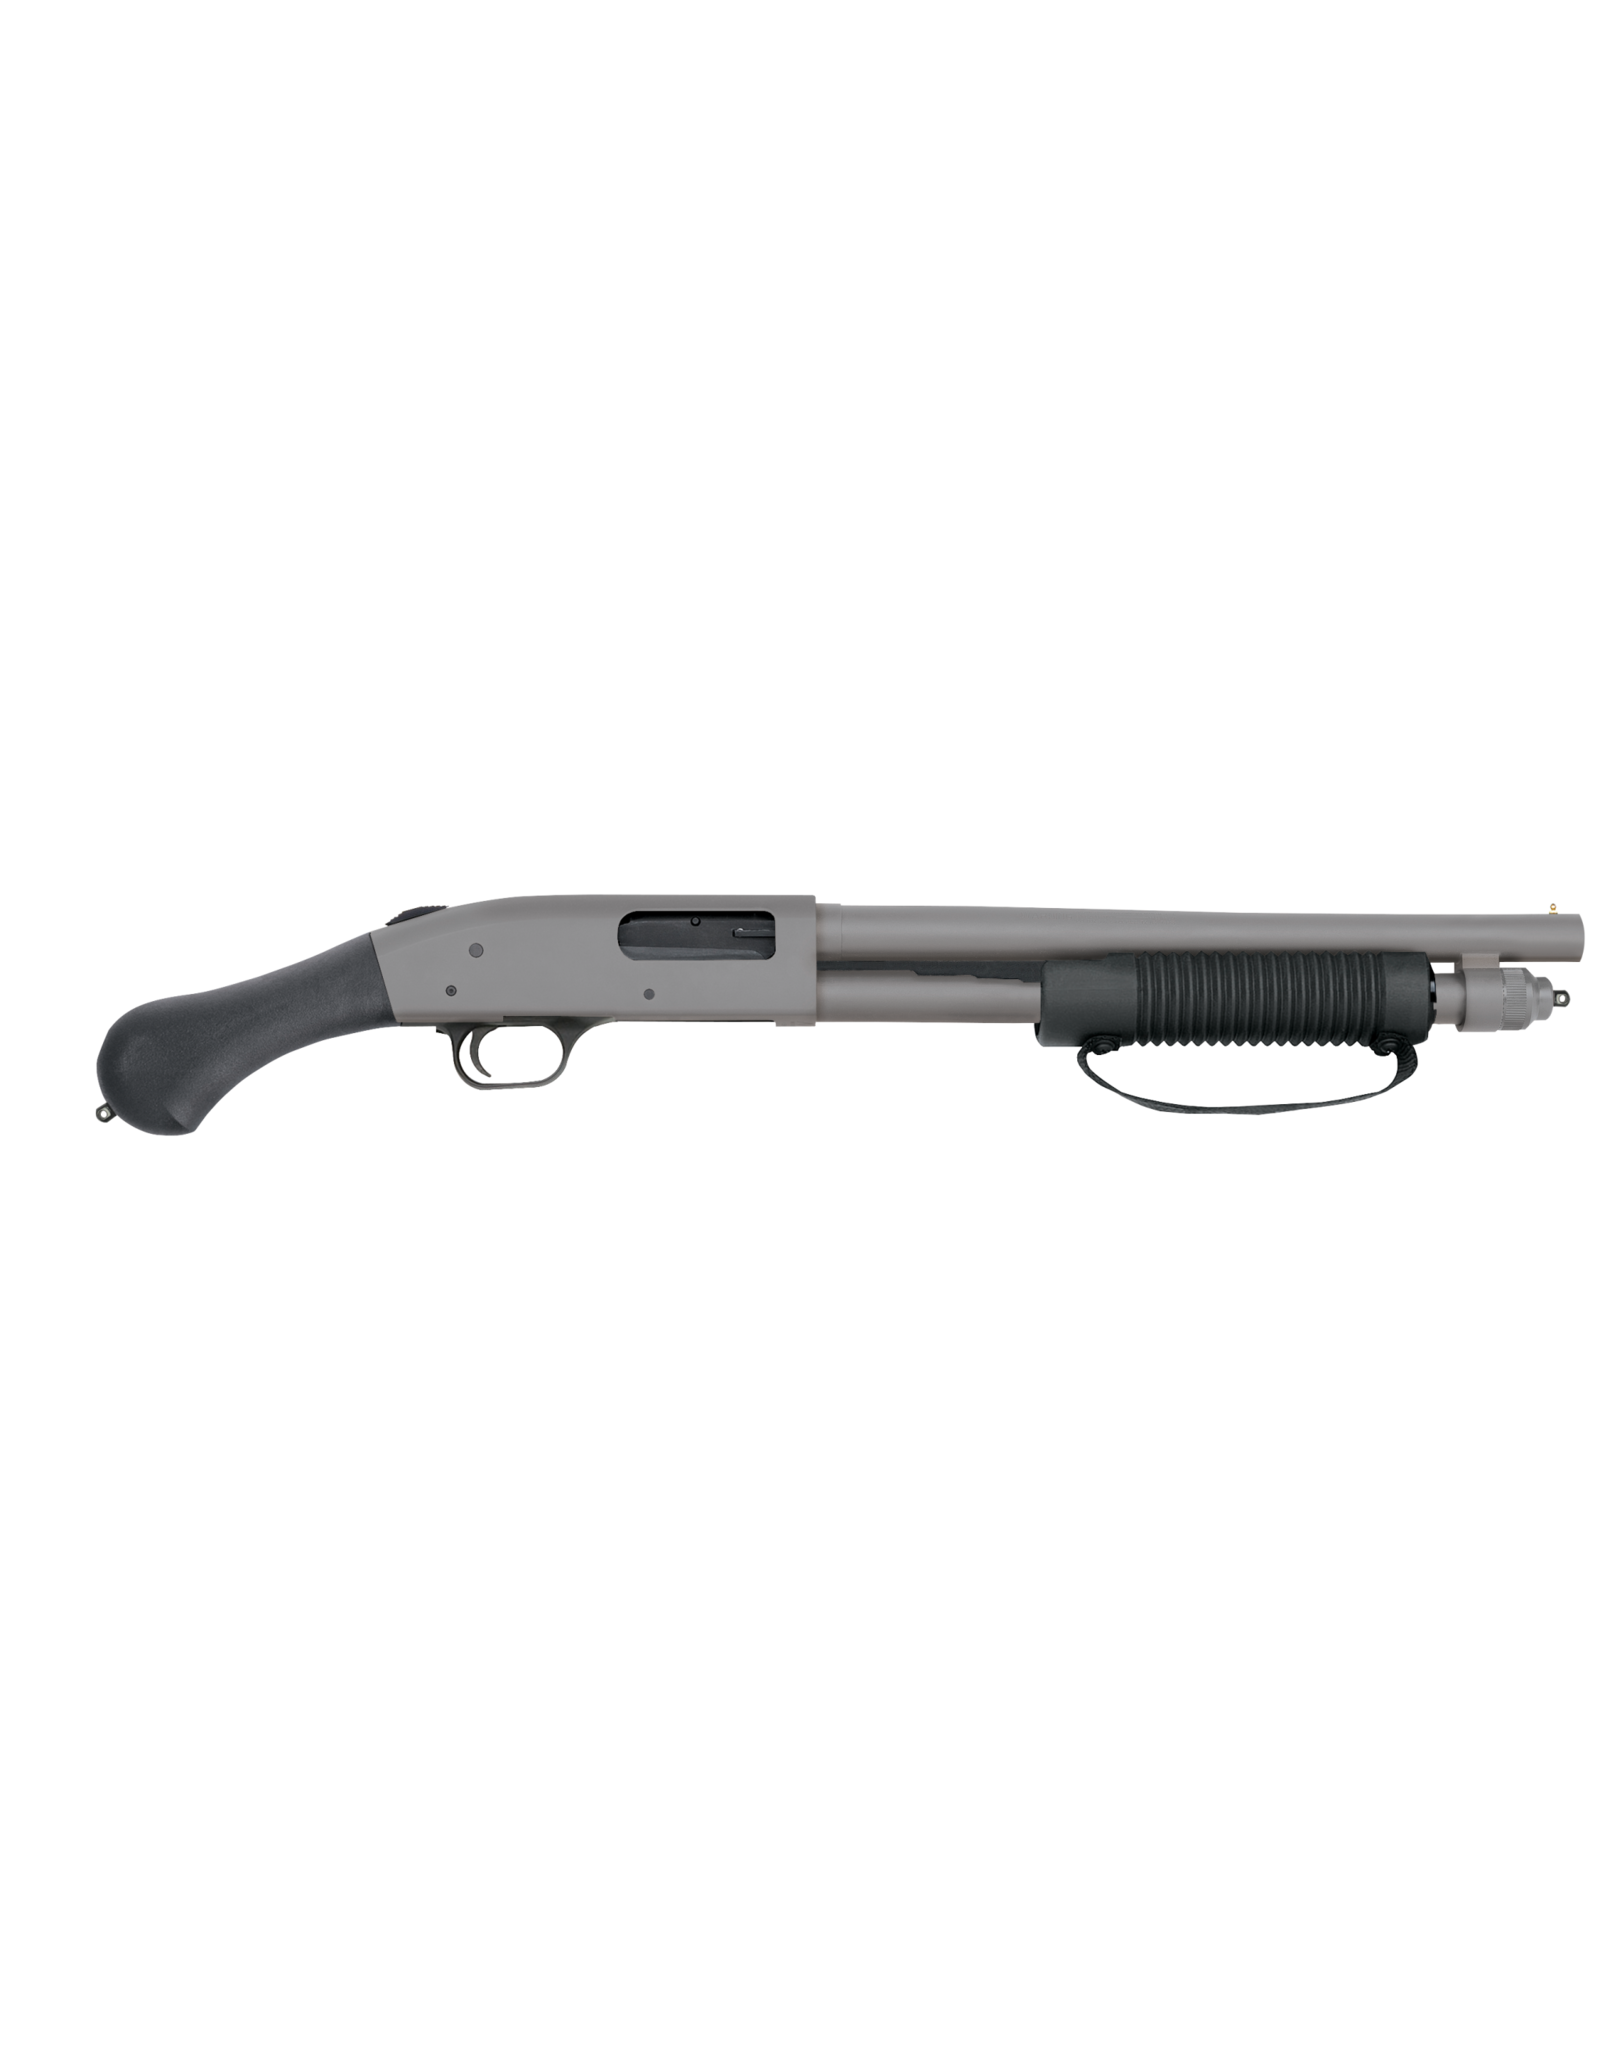 "Mossberg Mossberg 50656 590 JIC Shockwave Pump Shotgun, 12 Ga, 14"" Bbl"